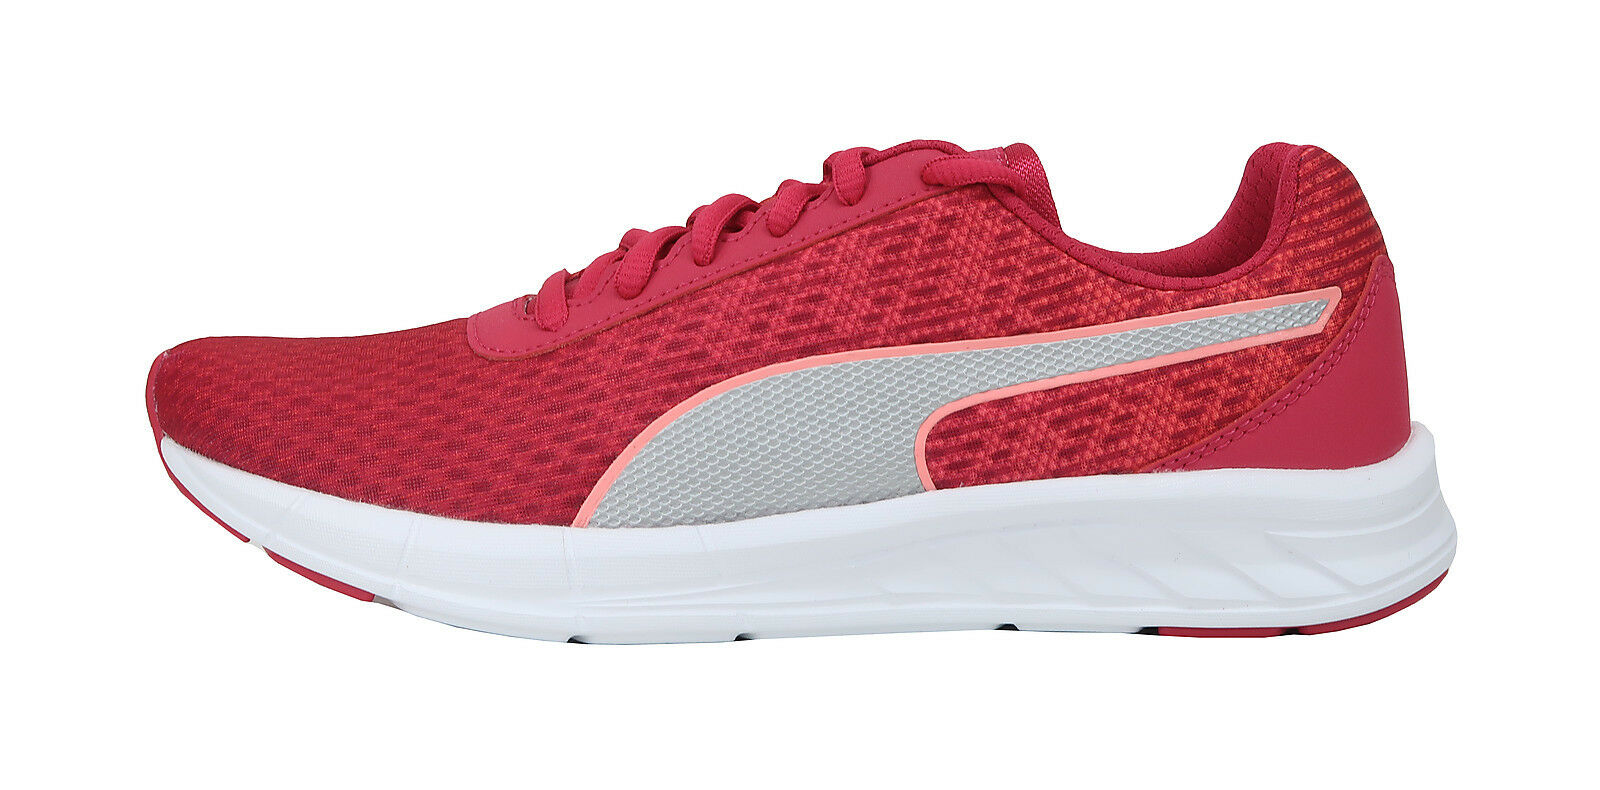 Puma Women Shoes Comet Love Potion White Comfort Light Weight Fushia Pink